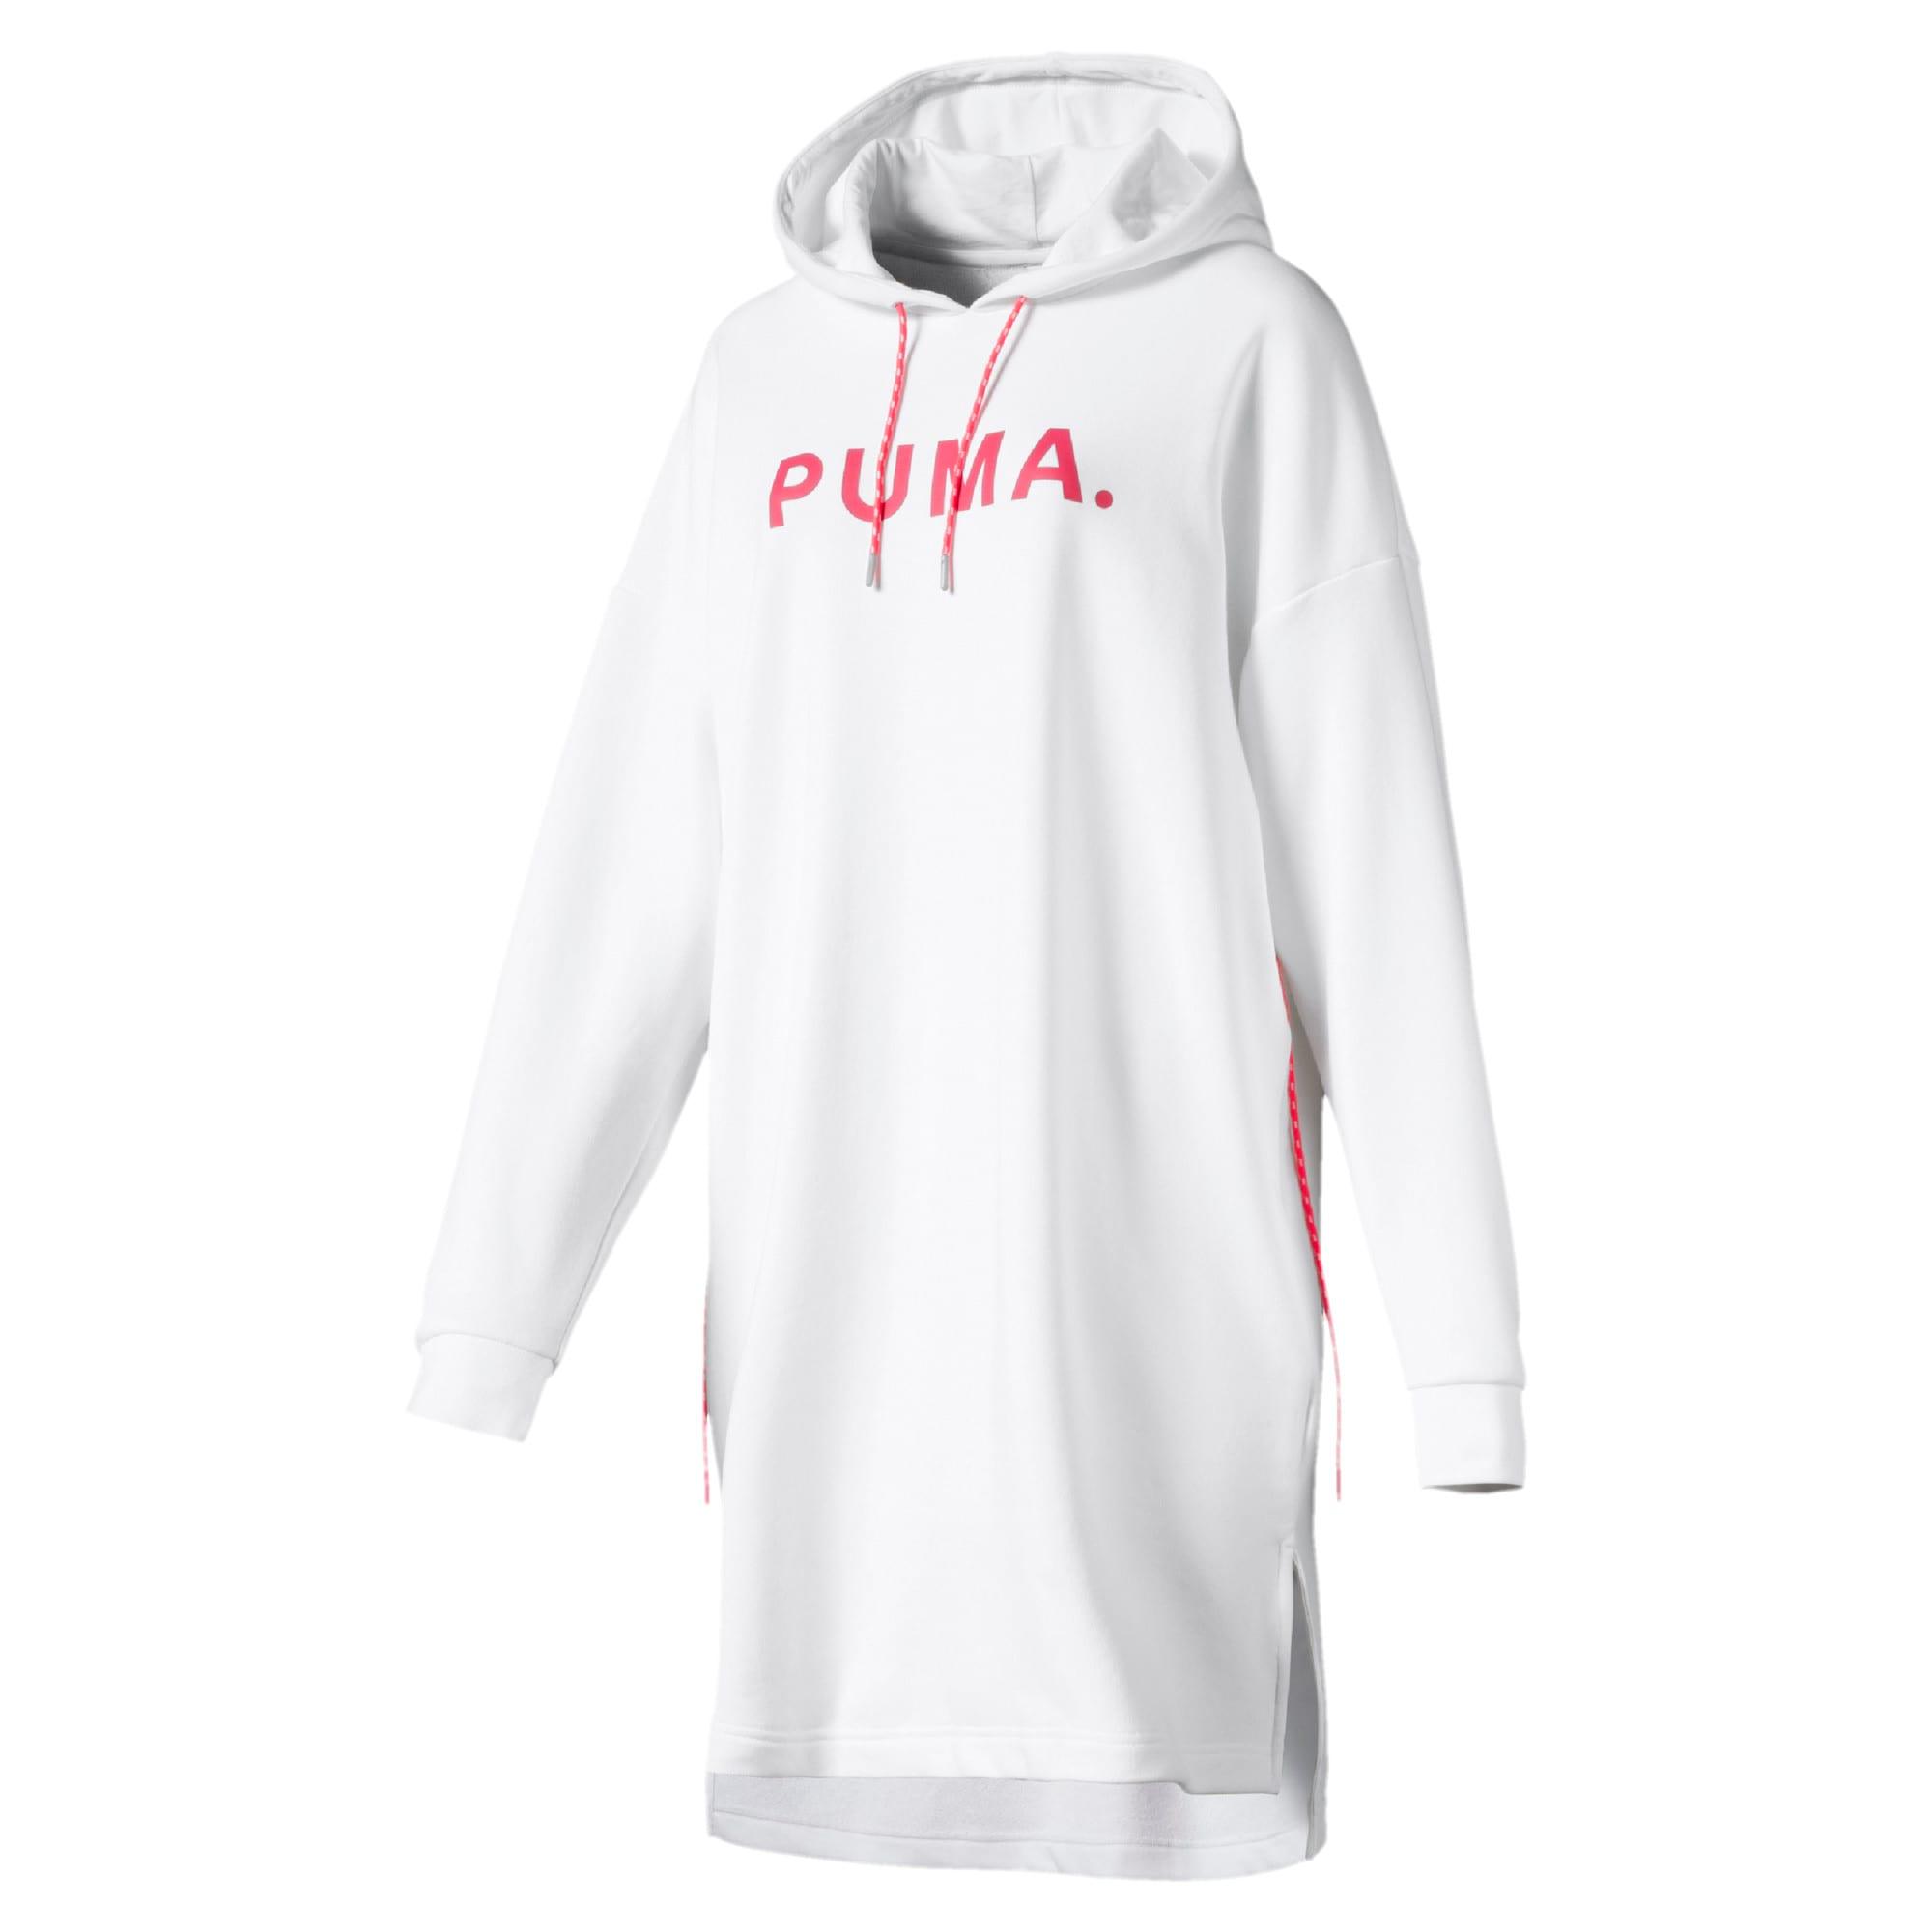 Thumbnail 1 of CHASE ウィメンズ フーデッドドレス, Puma White, medium-JPN